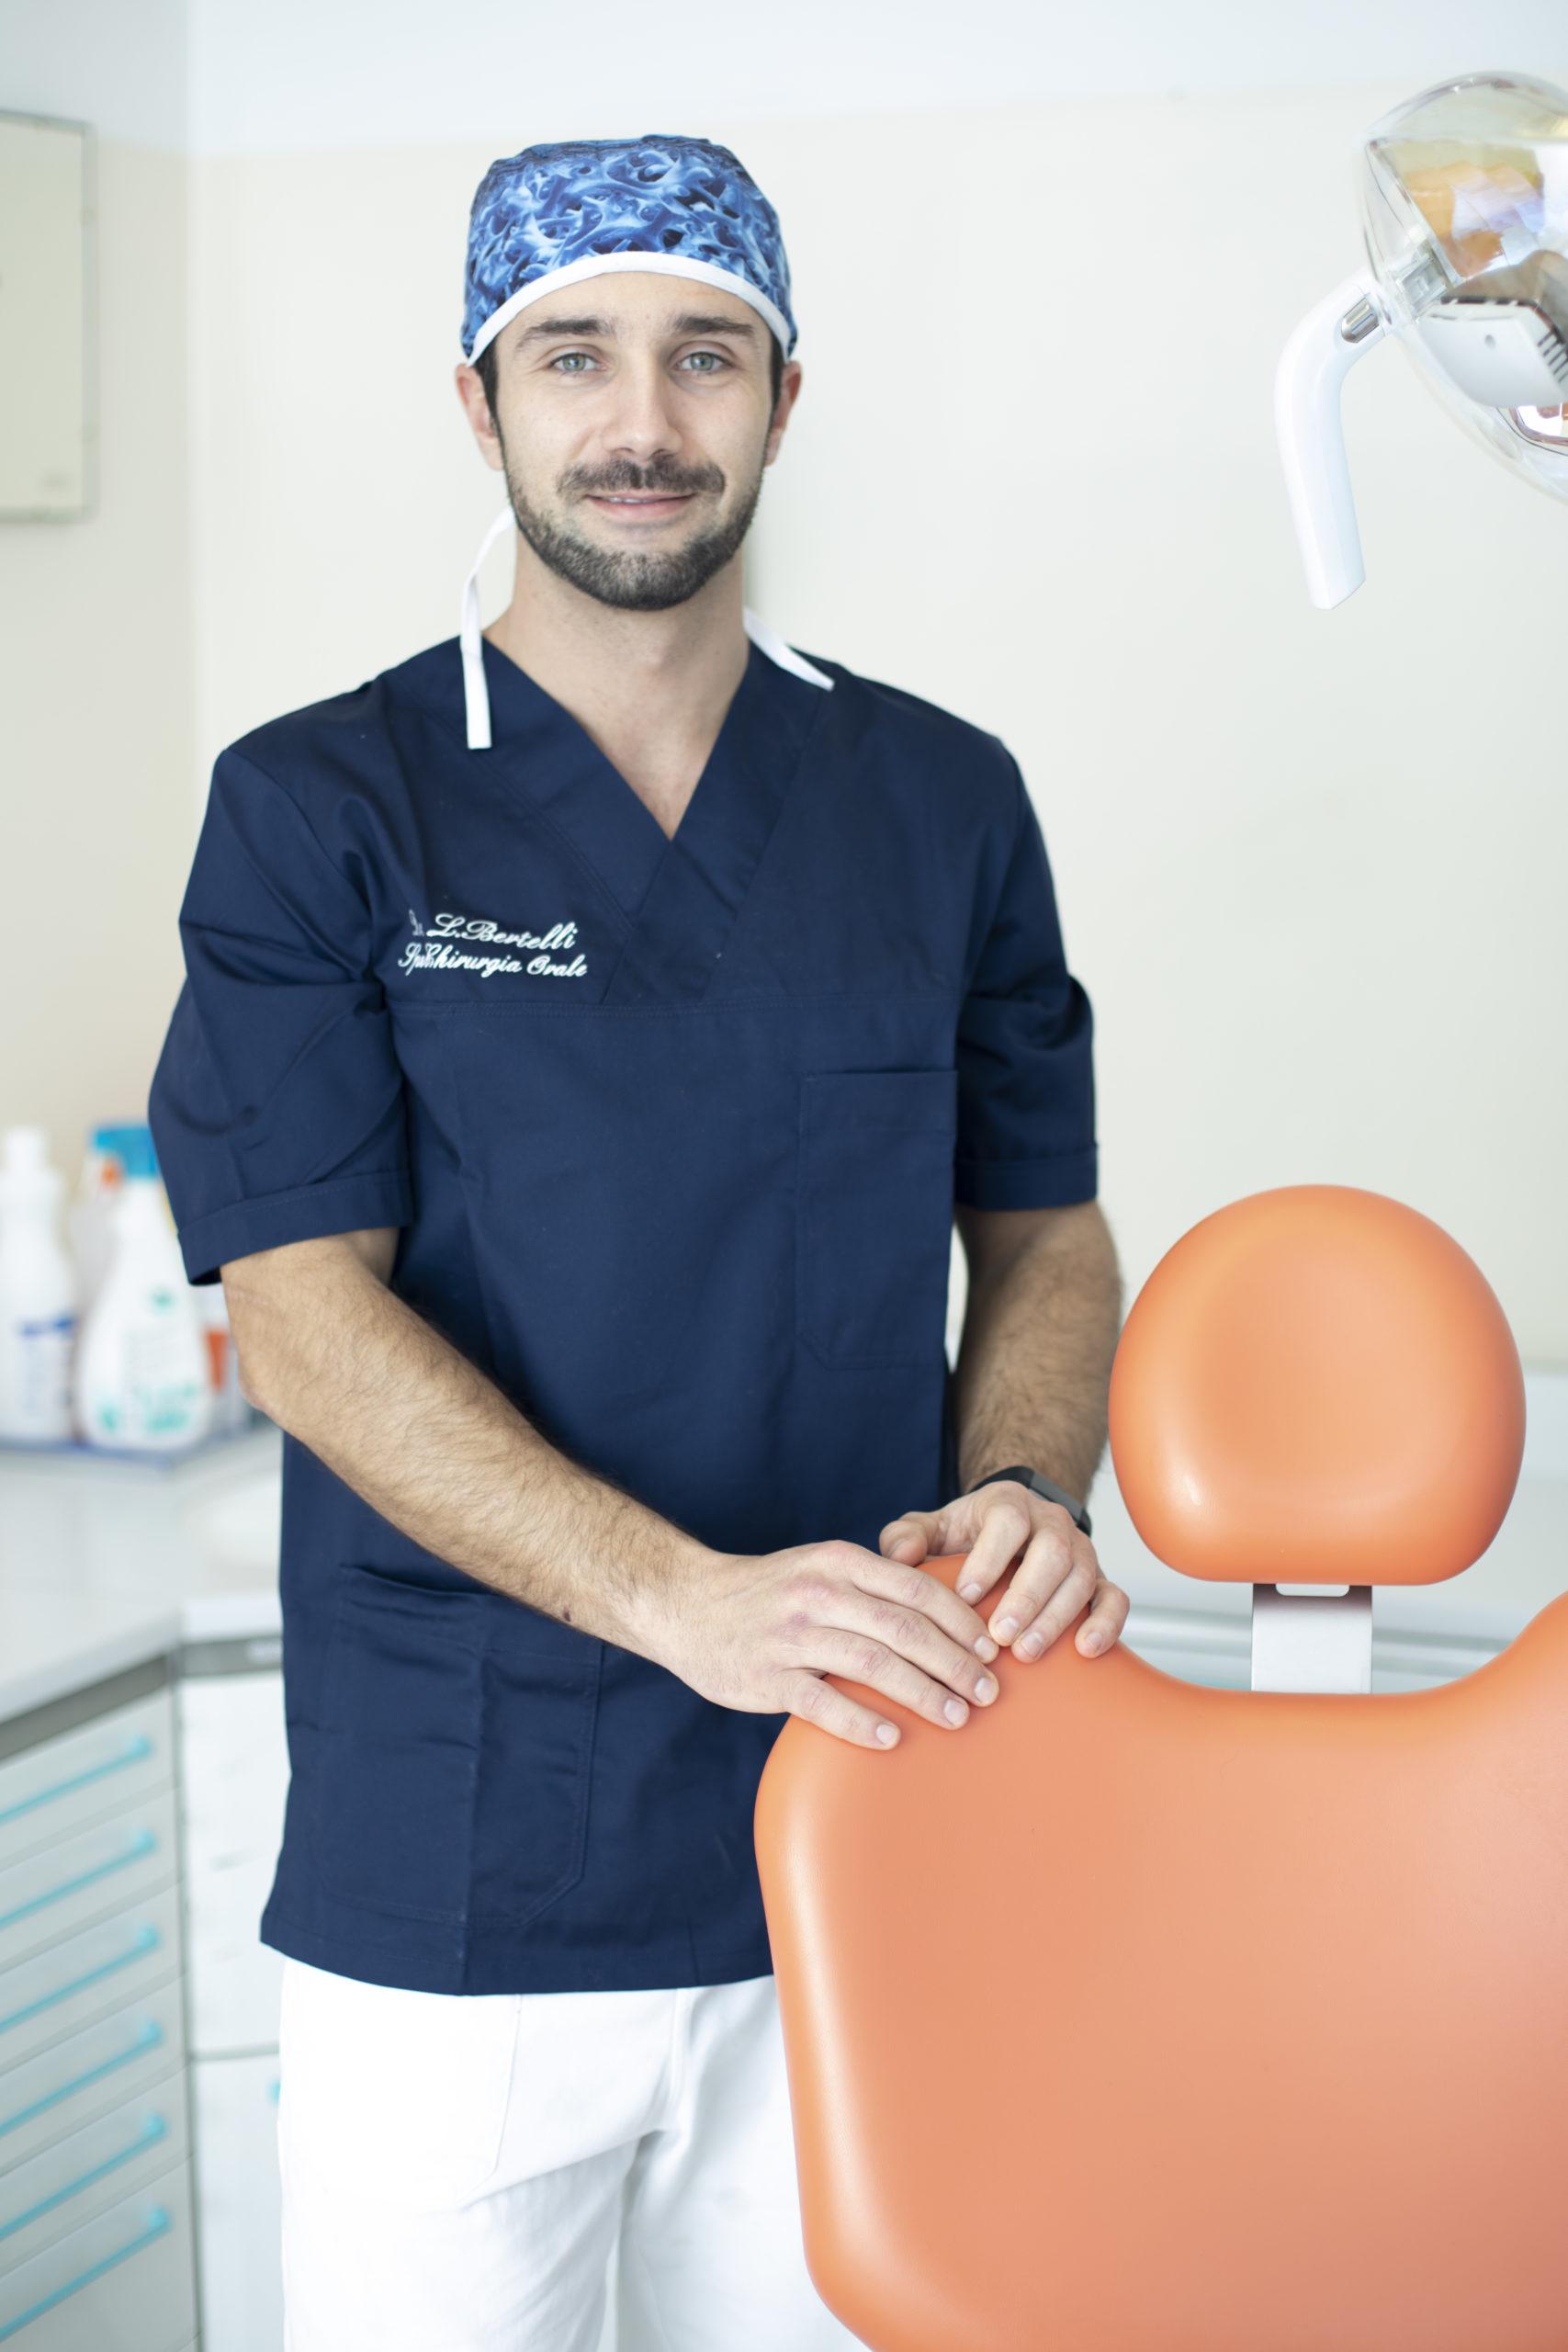 DR. LORENZO BERTELLI